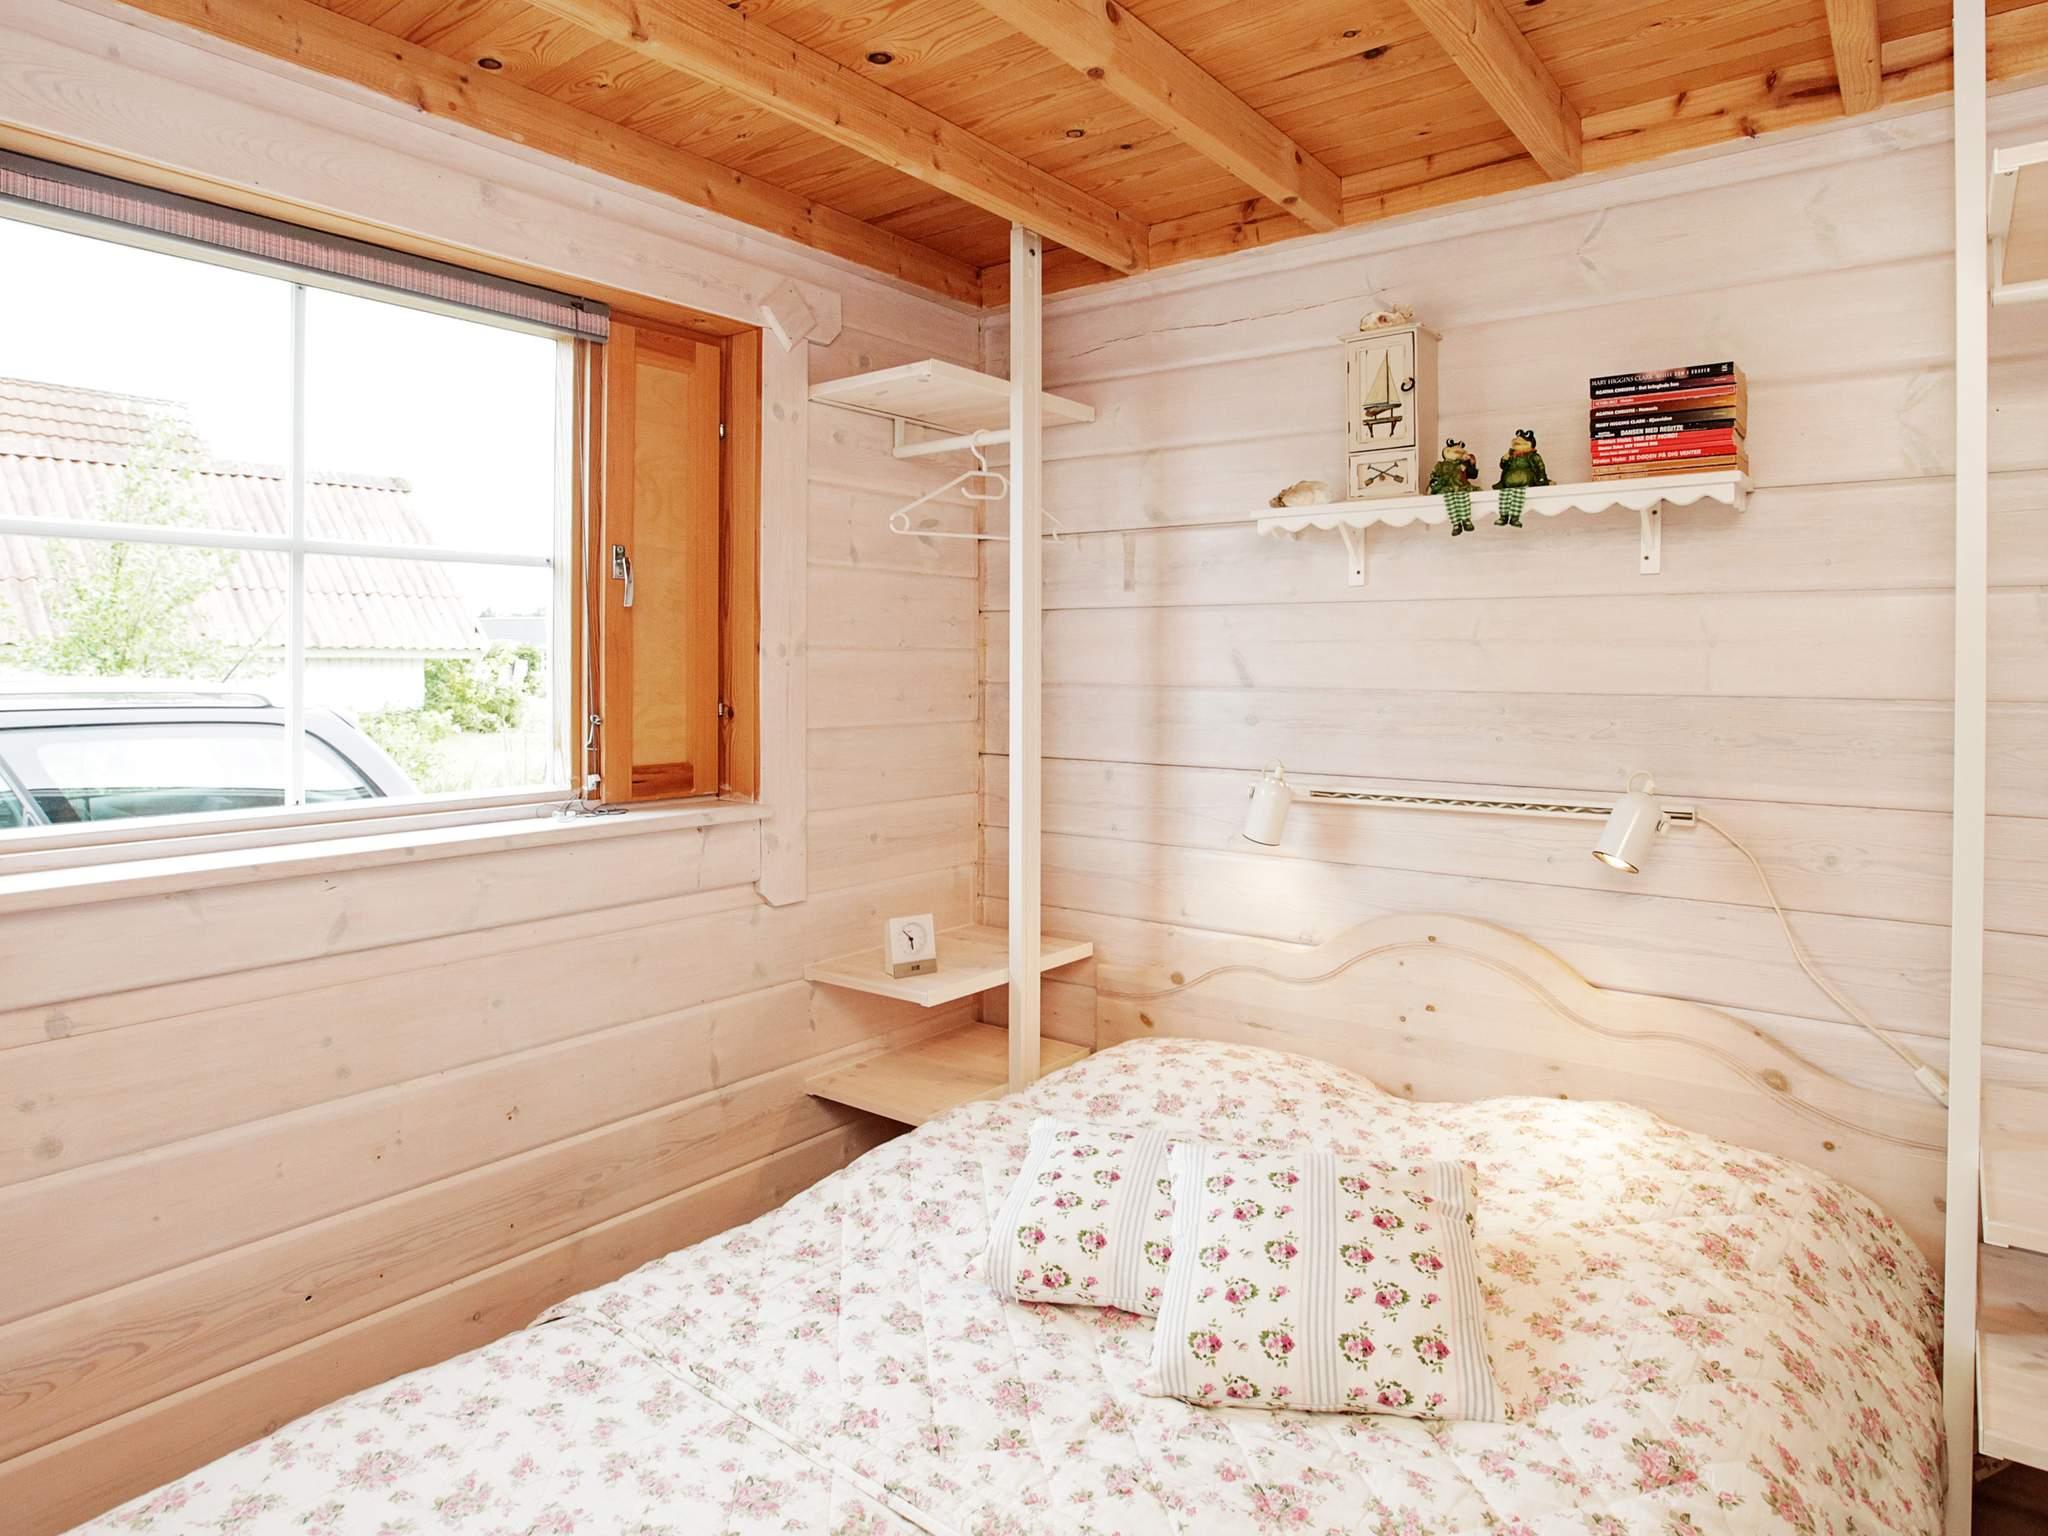 Maison de vacances Eskov Strandpark (603988), Roslev, , Limfjord, Danemark, image 6